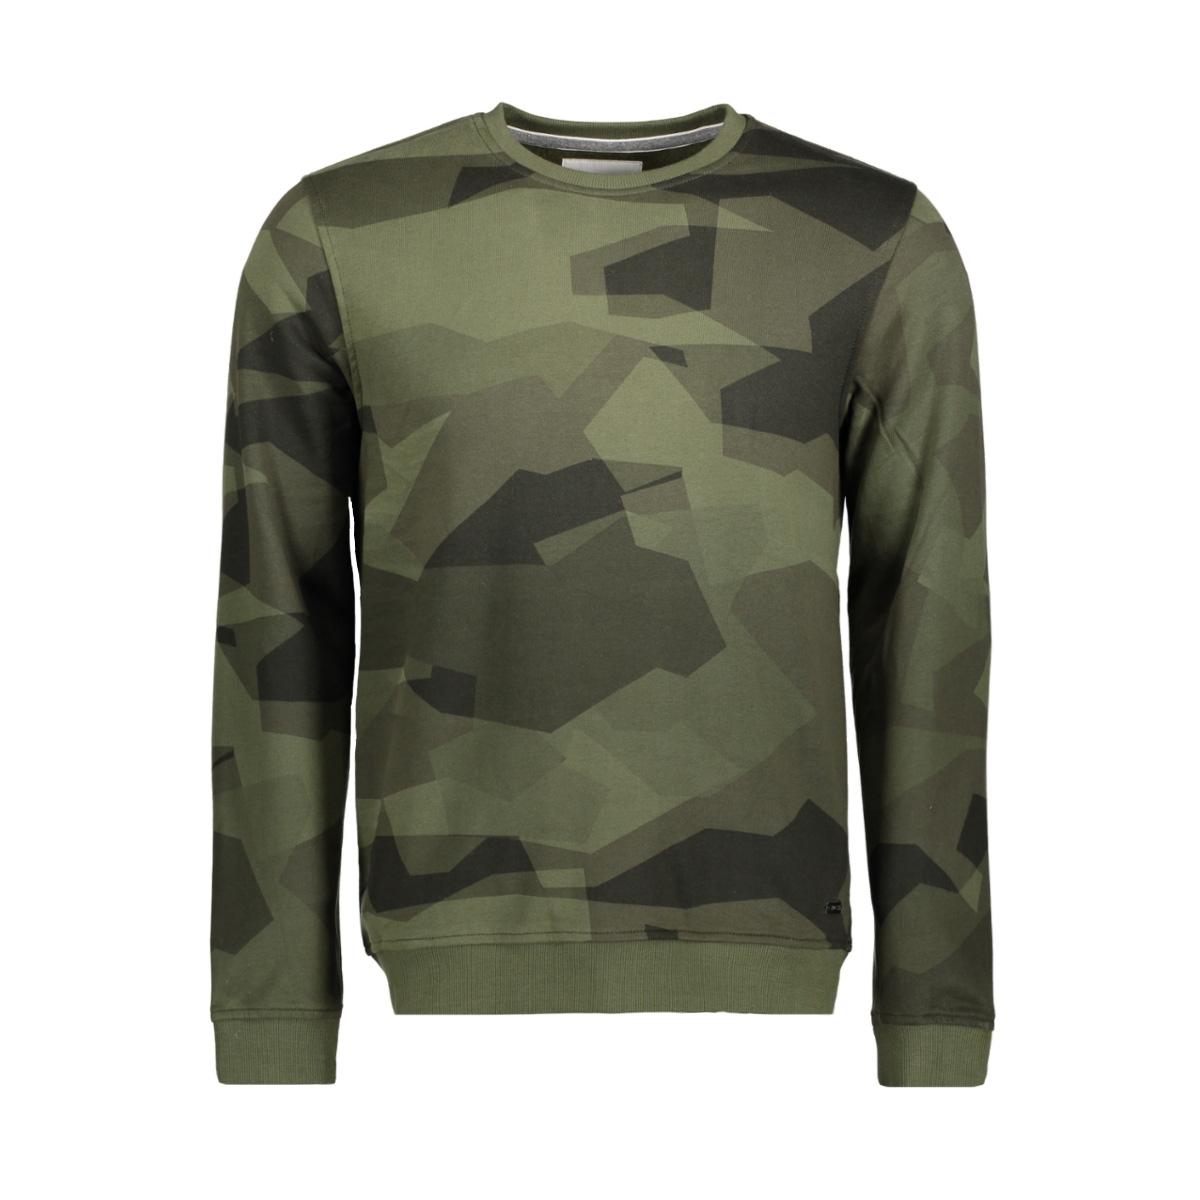 107cc2j011 edc sweater c360